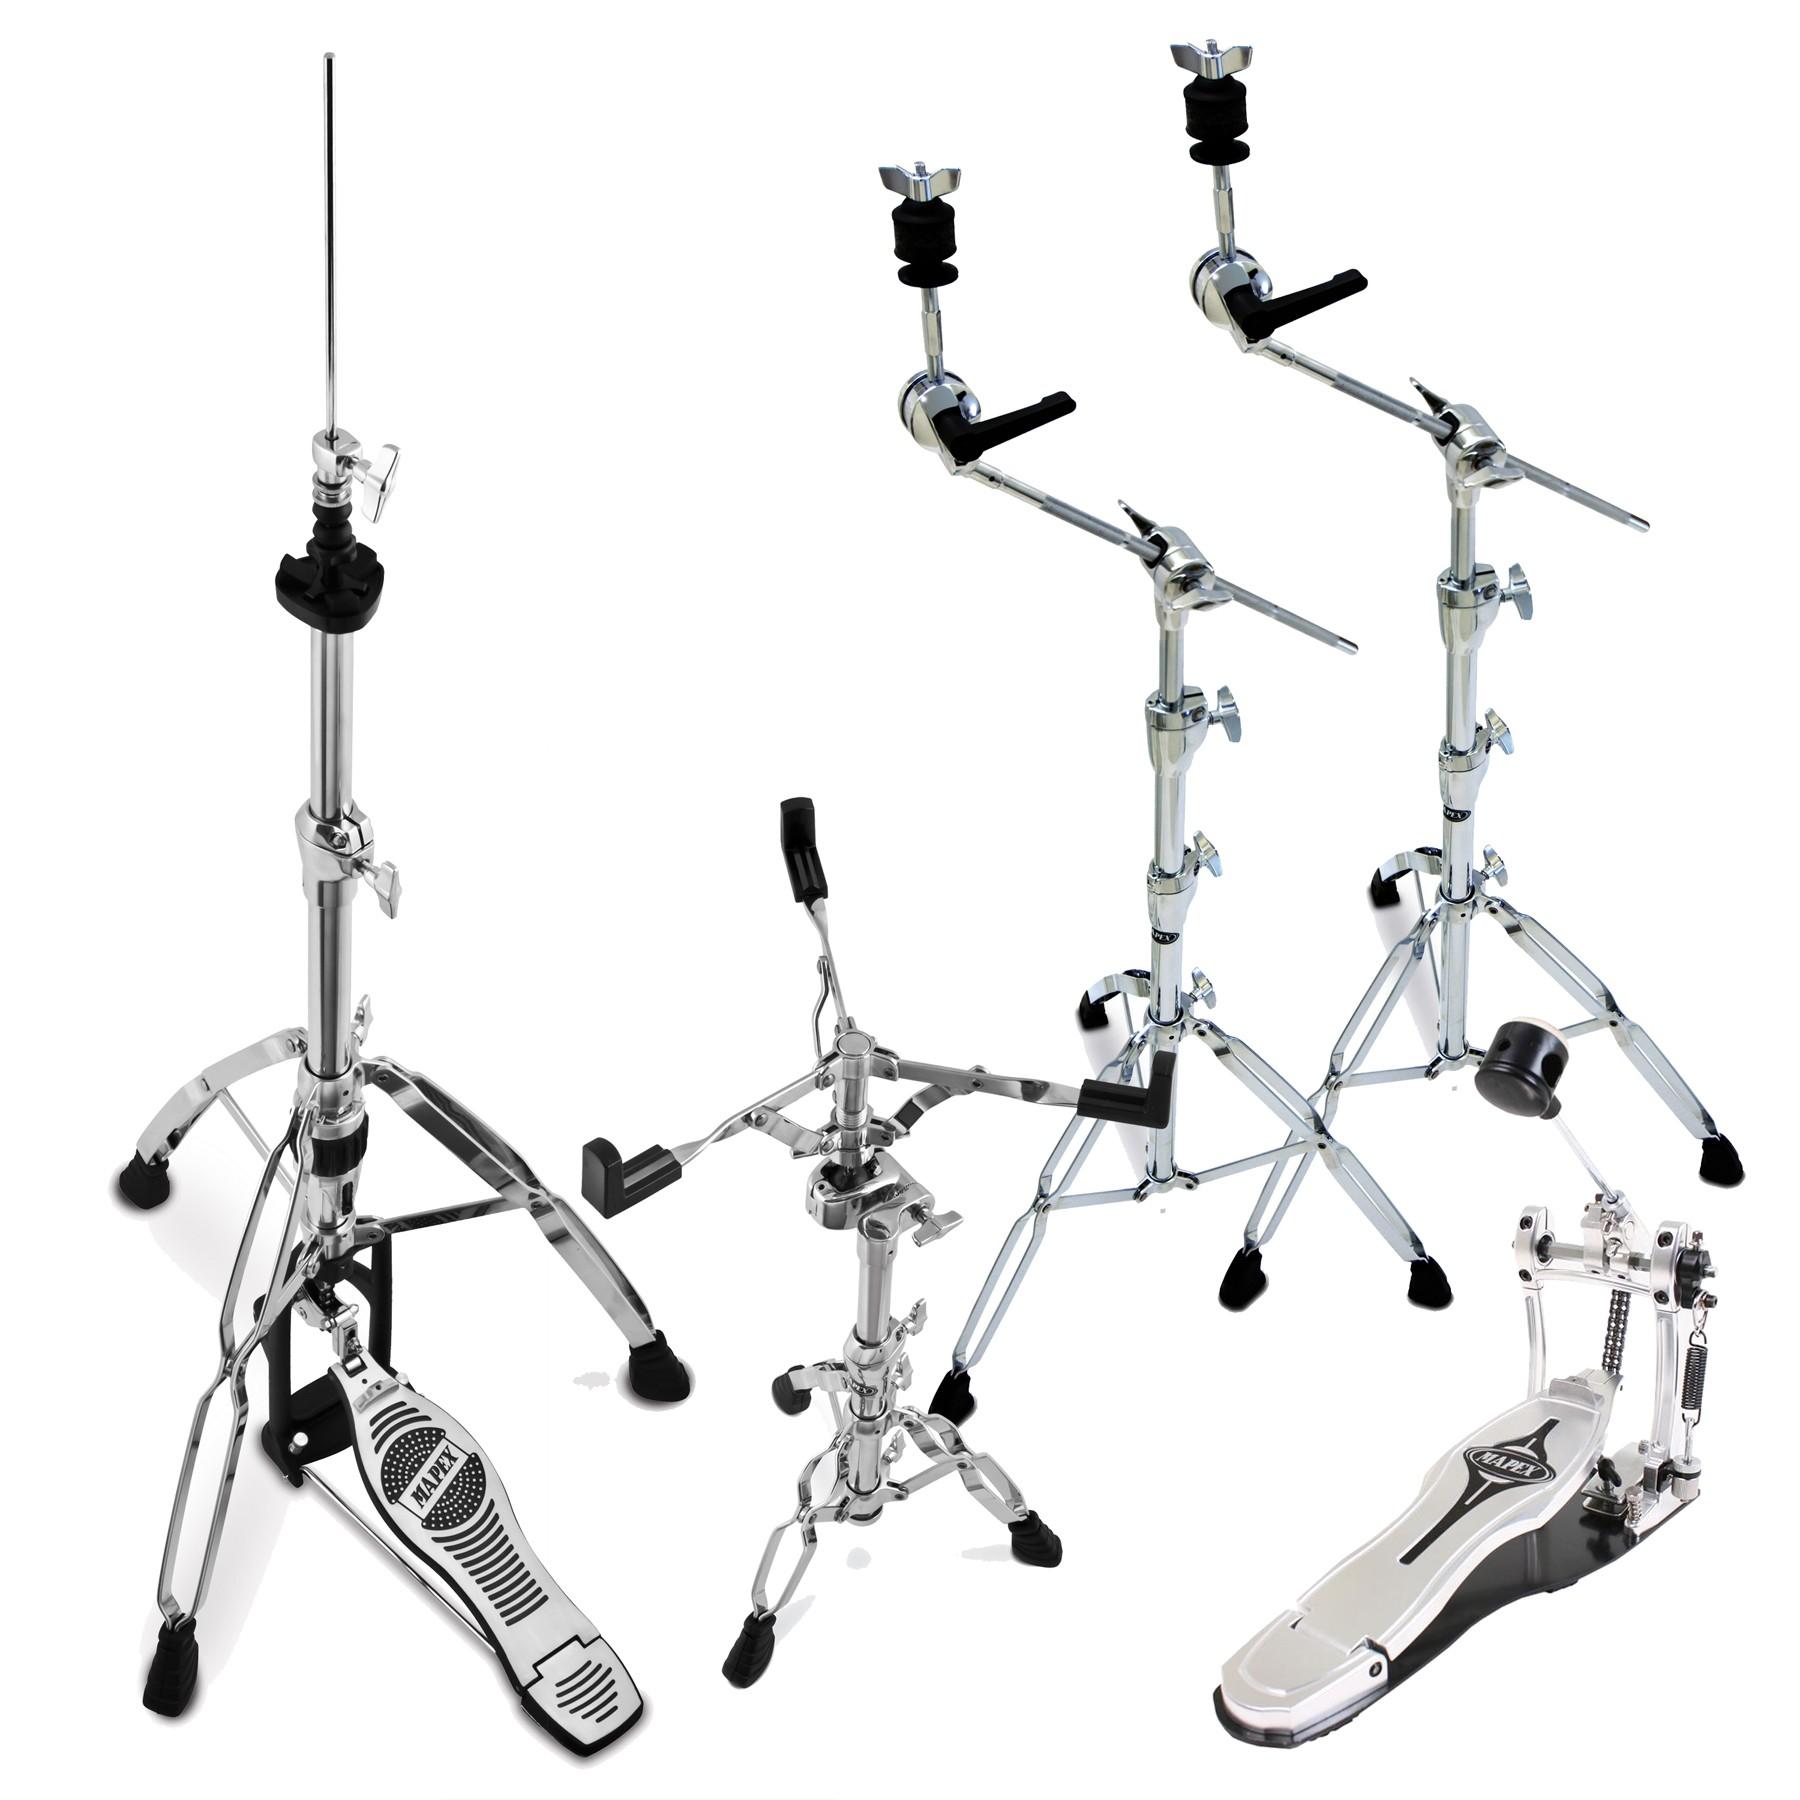 Hardware drumstel: Dubbelbenige statieven